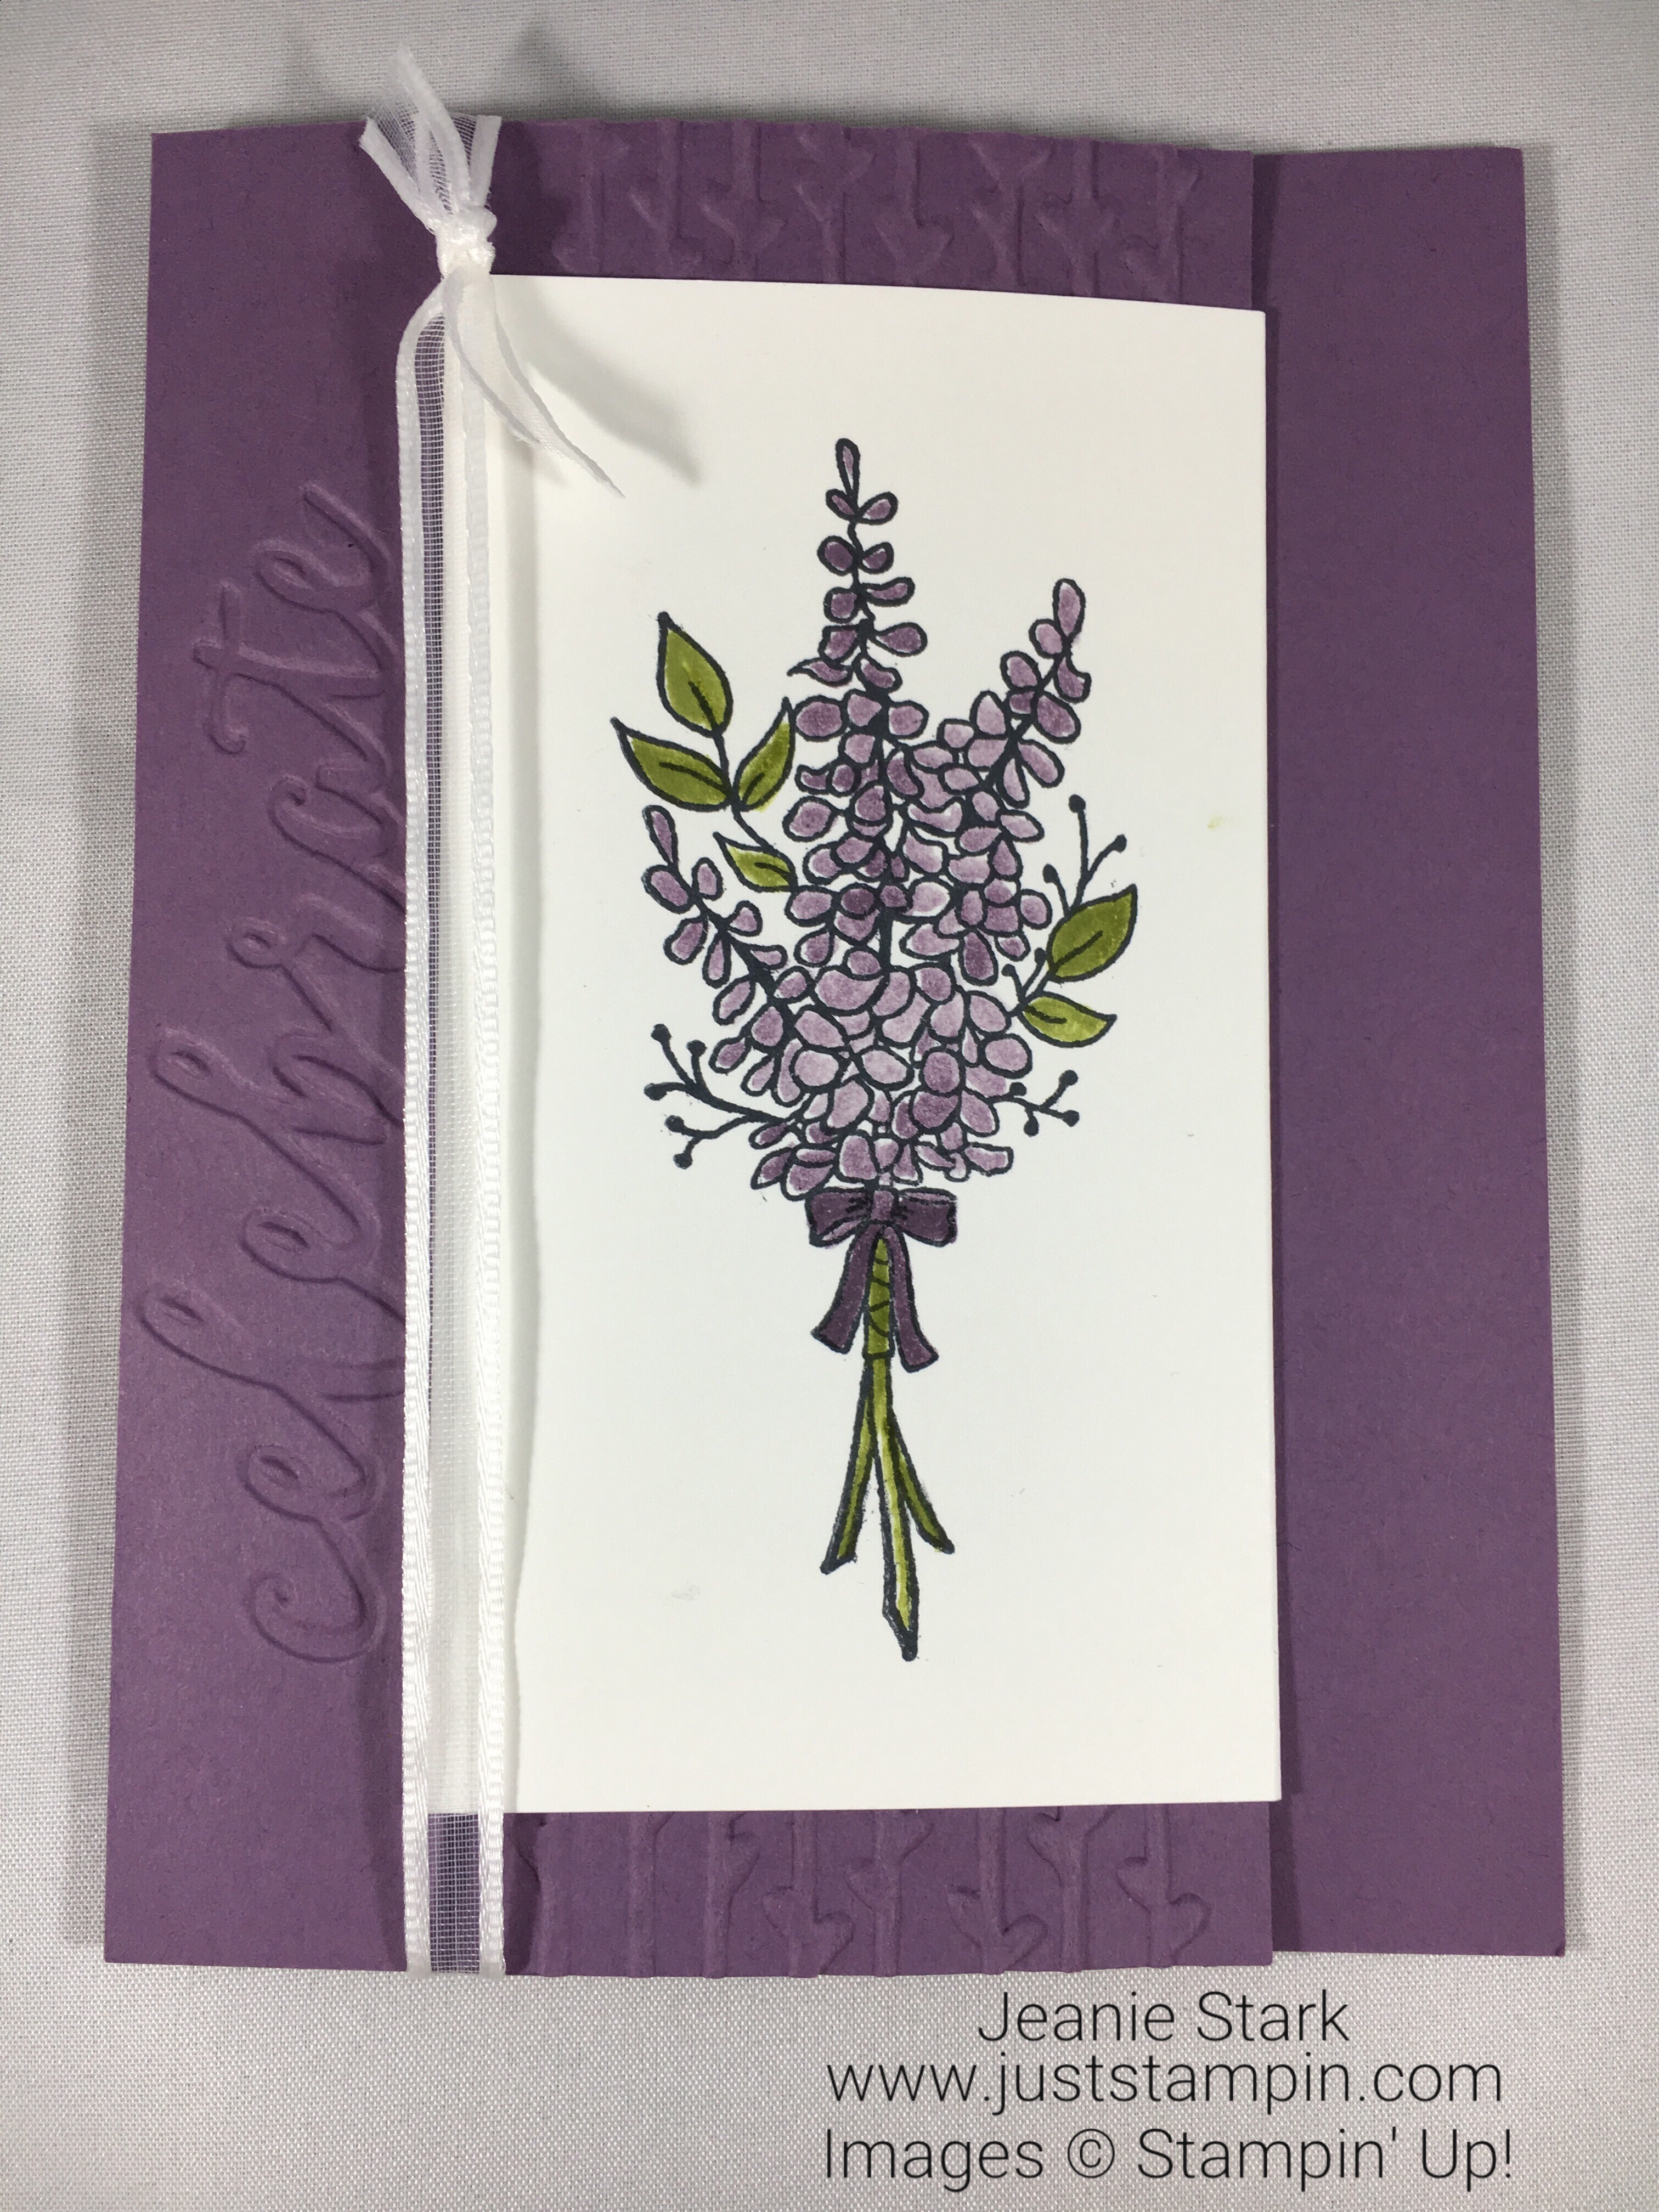 Stampin Up Lots of Lavender joy fold celebrate card idea - Jeanie Stark StampinUp